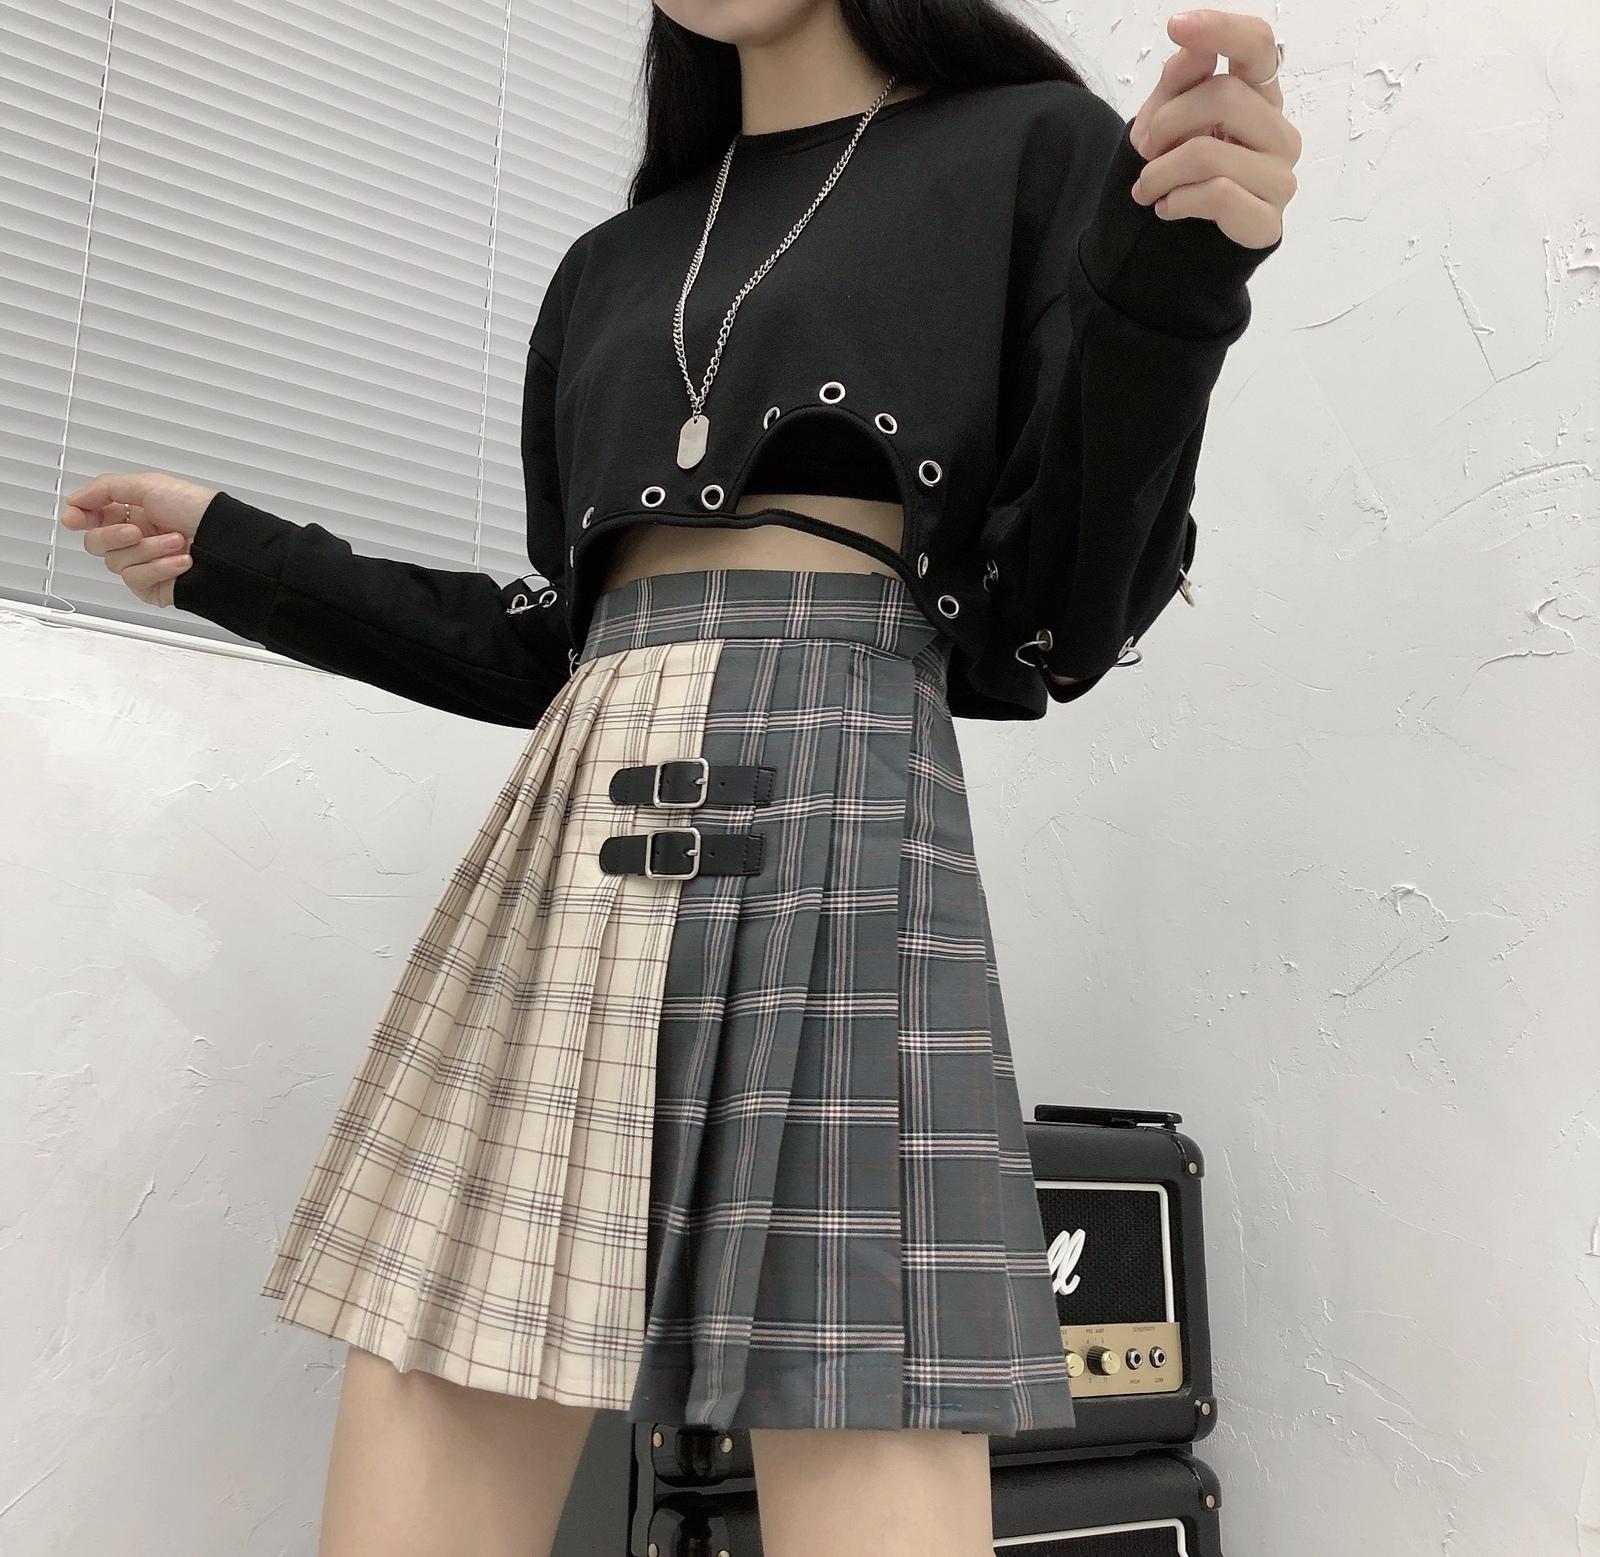 Black Navy Red Mini Plaid Skirt Women Street Style Pleated PLAID SKIRT Plus Size image 4